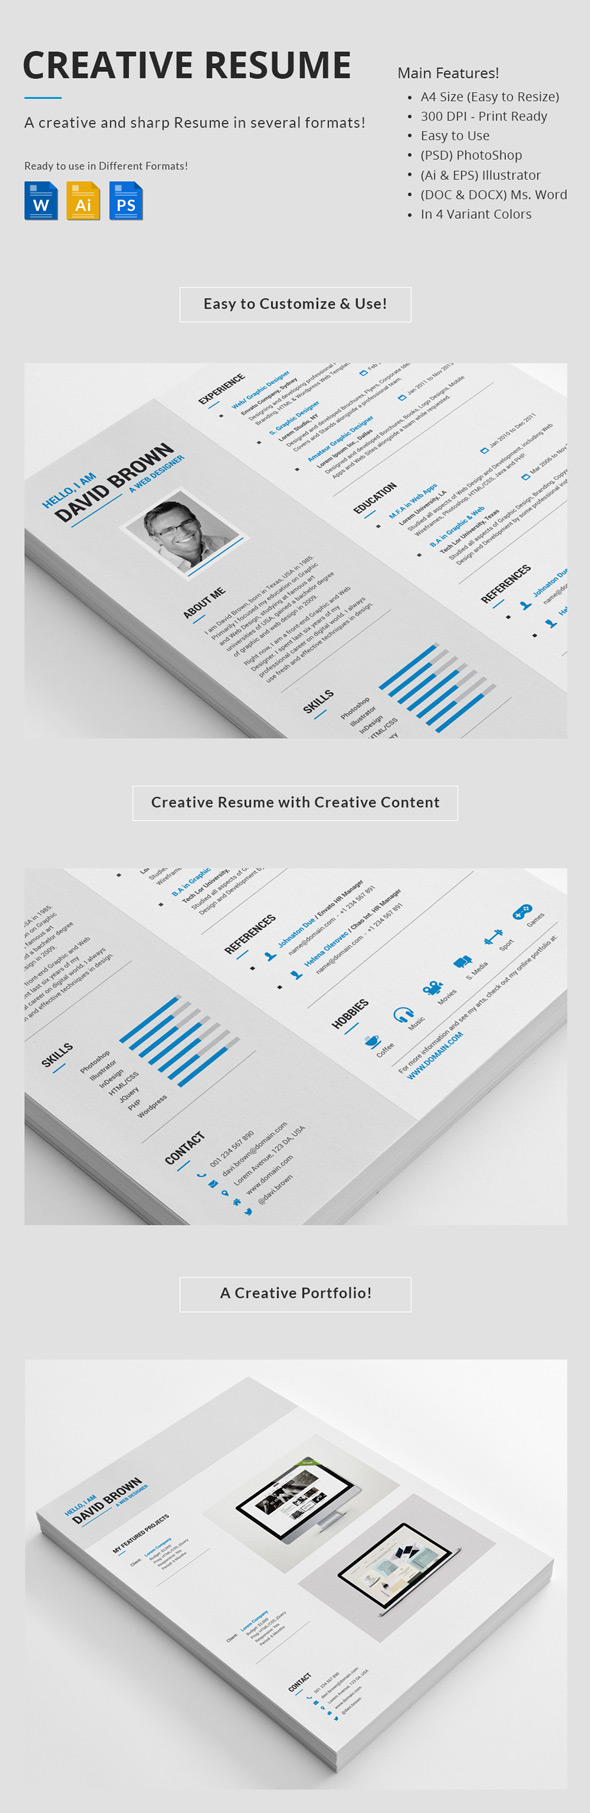 Professional Creative Resume Set